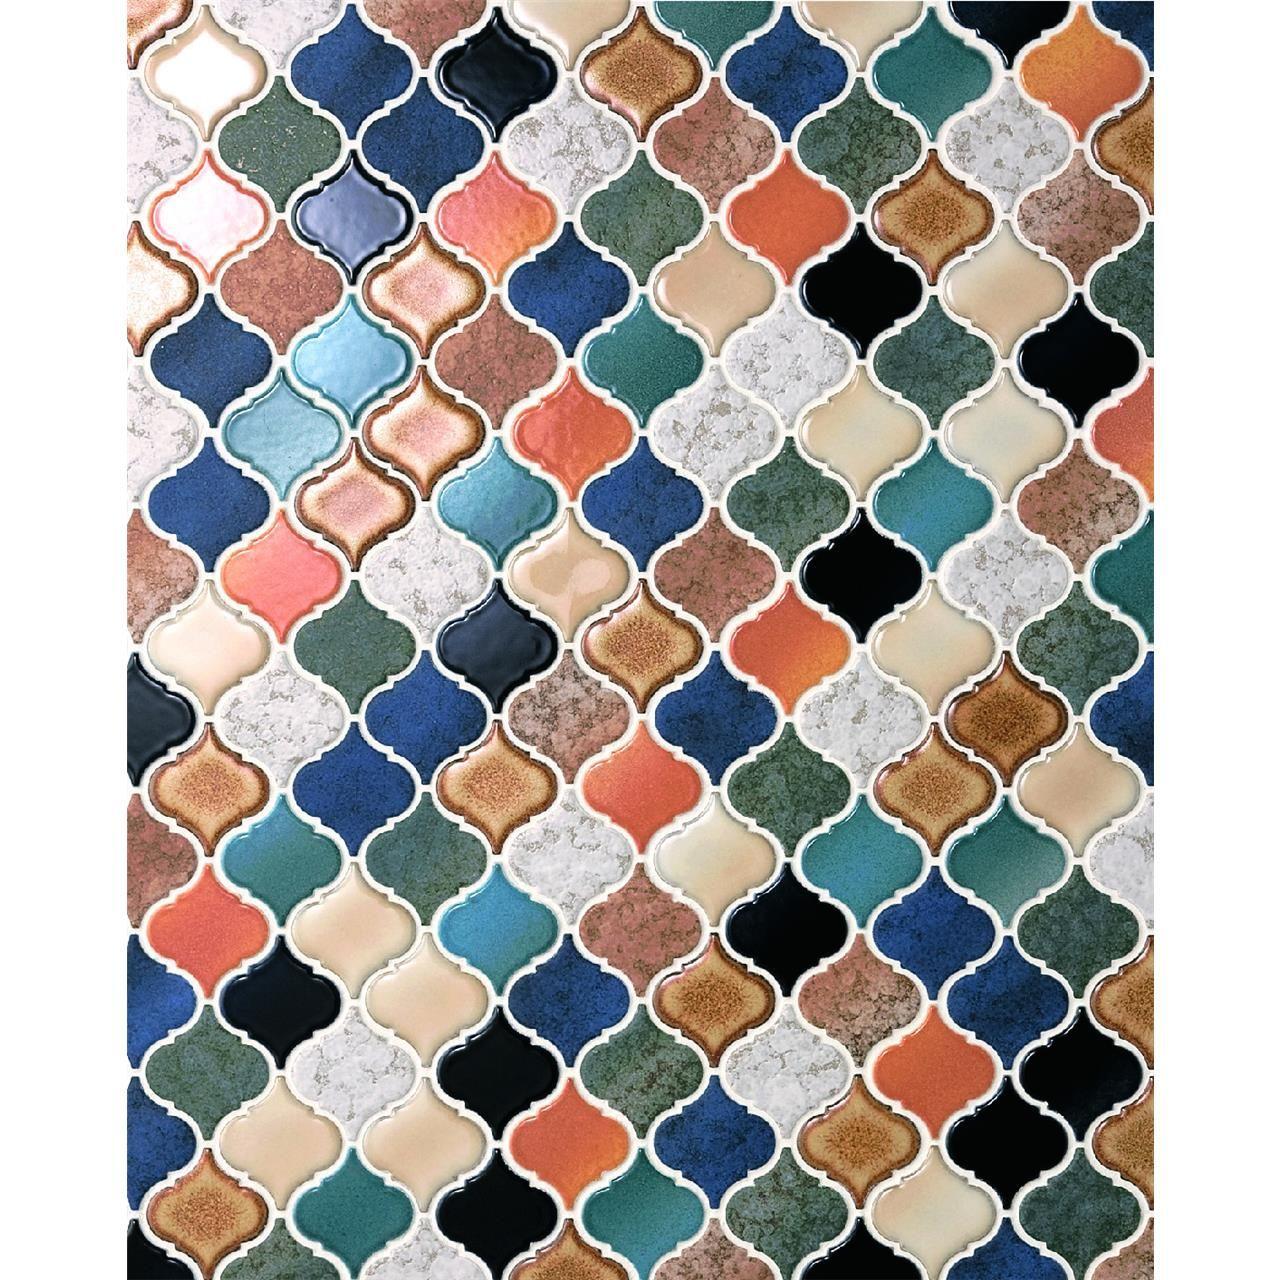 Random Kitchen Tile Patterns: MOSAIC.A ~ CORABEL コラベル ( MIX PATTERN )